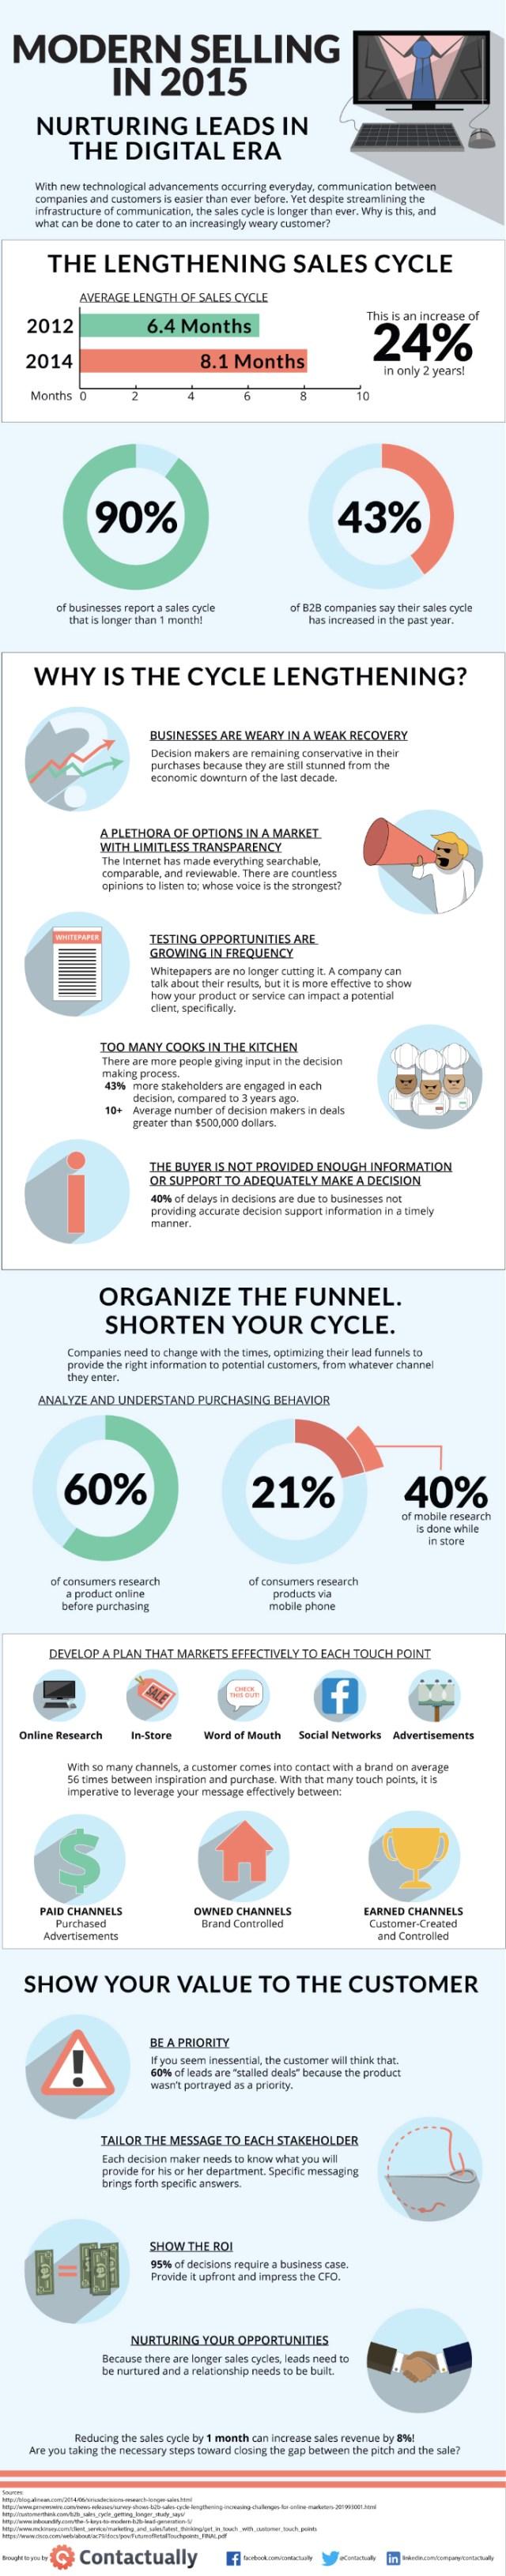 Contactually-Modern-Salesman-Infographic-21